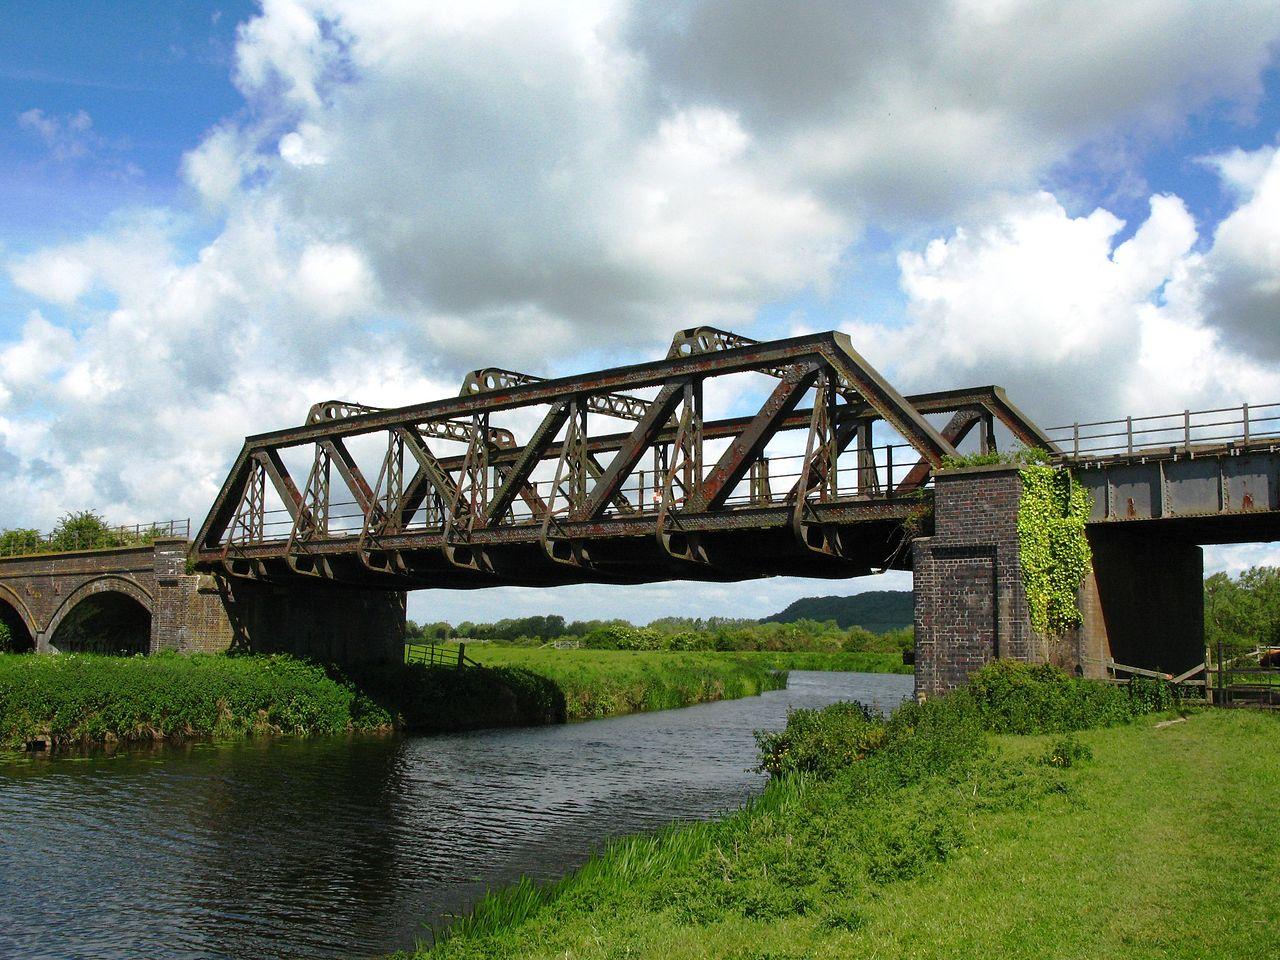 Network Rail Improvement Work Nearing Completion